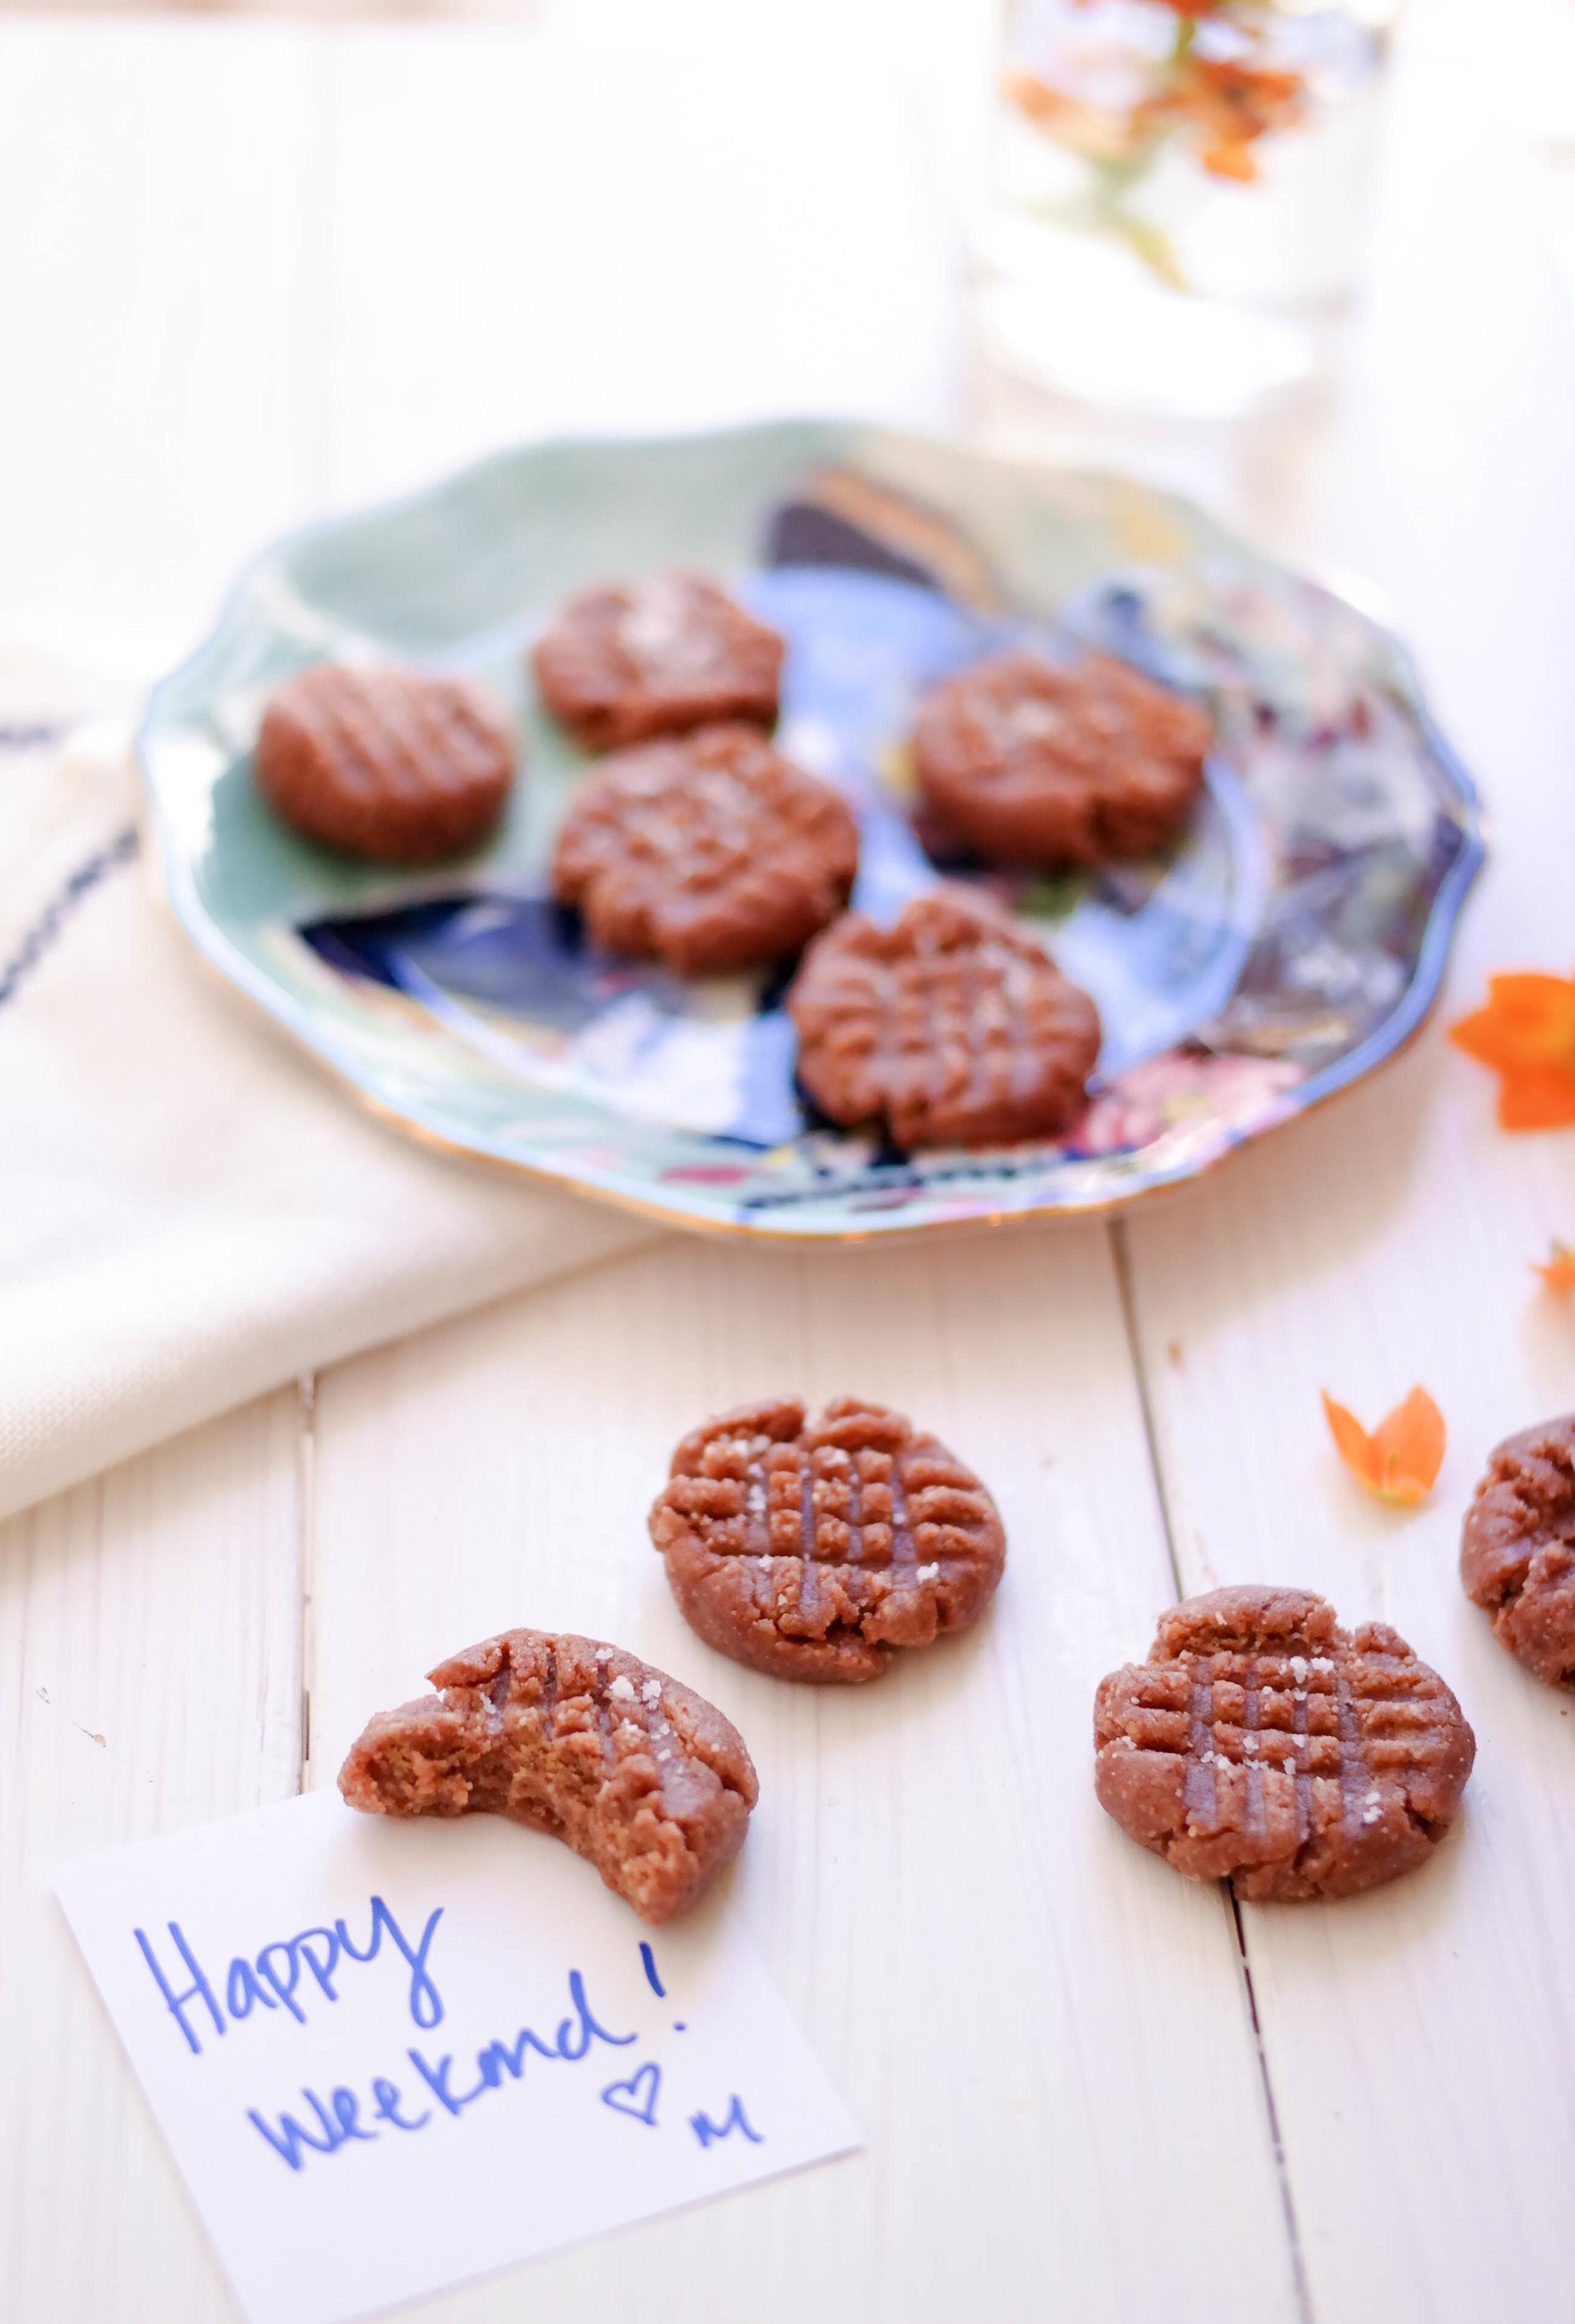 No-Bake-Almond-Butter-Cookies   www.8thandlake.com